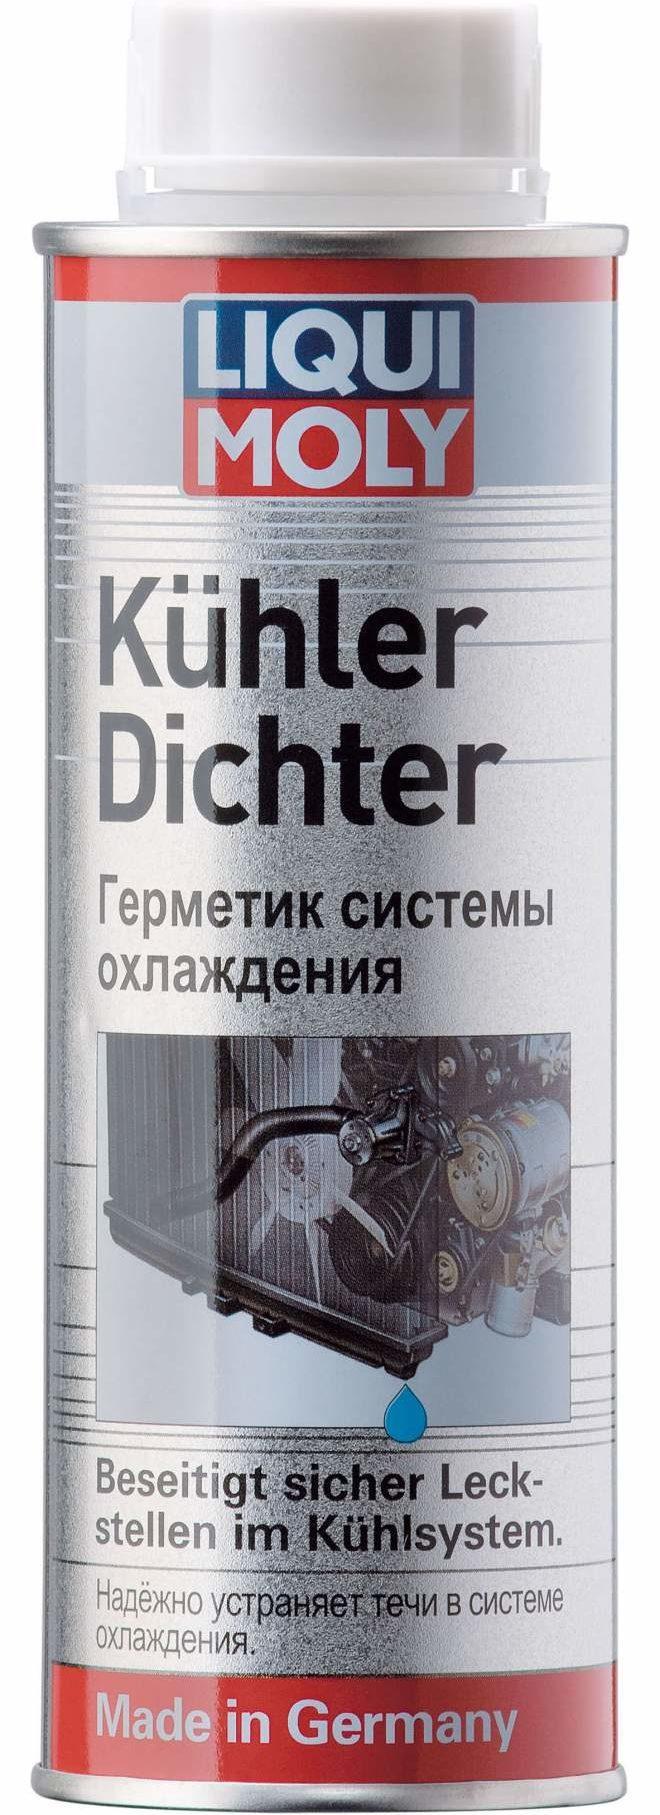 «LIQUI MOLY» KuhlerDichter 1997